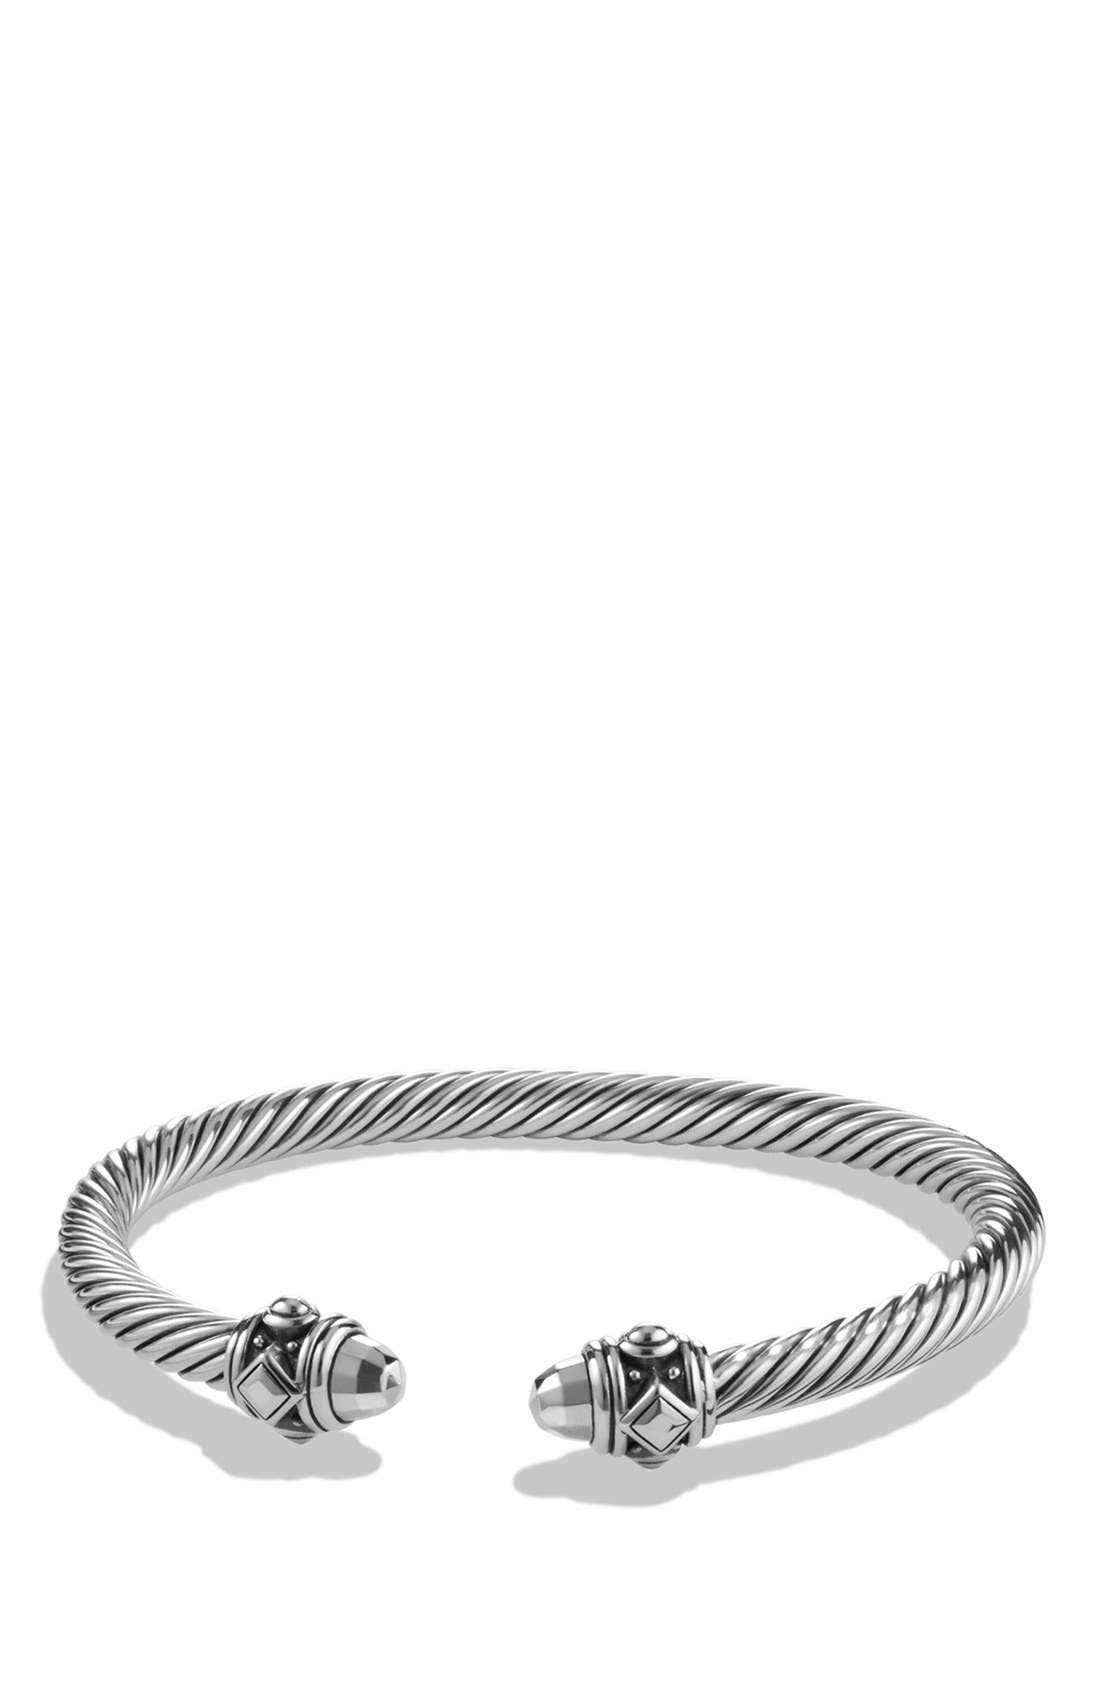 Main Image - David Yurman 'Renaissance' Bracelet, 5mm